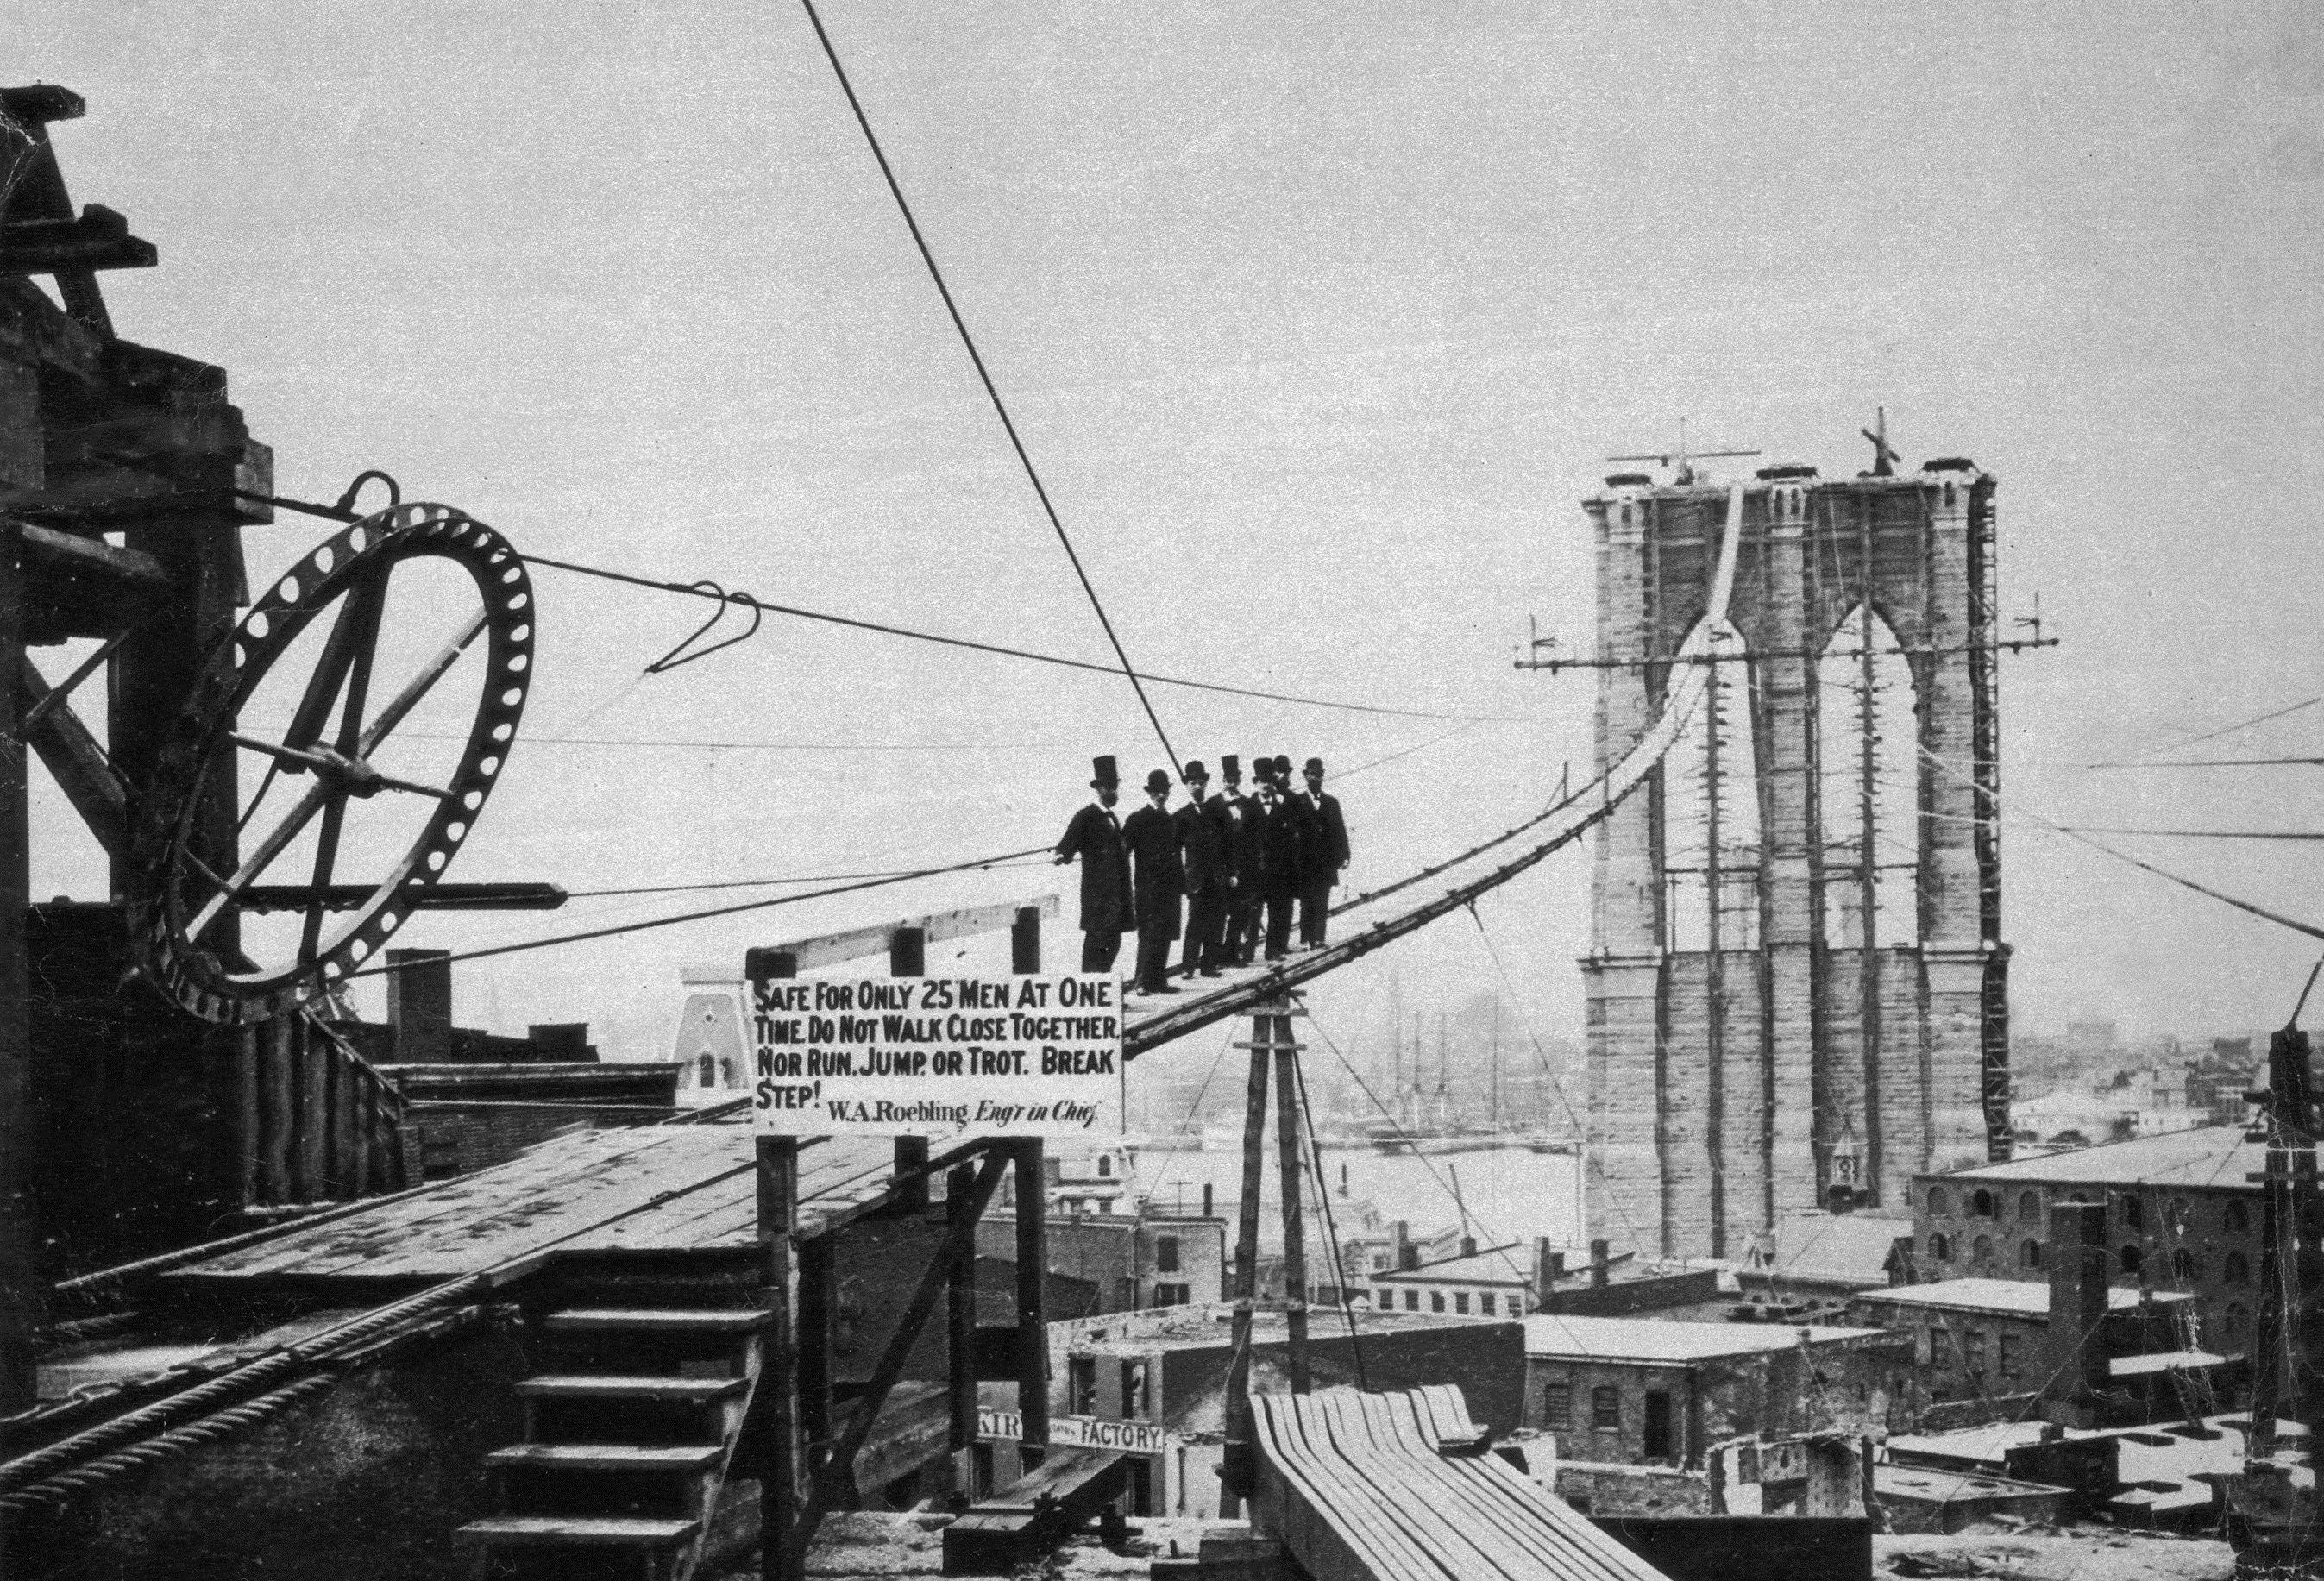 Photograph of men on catwalk during Brooklyn Bridge construction.